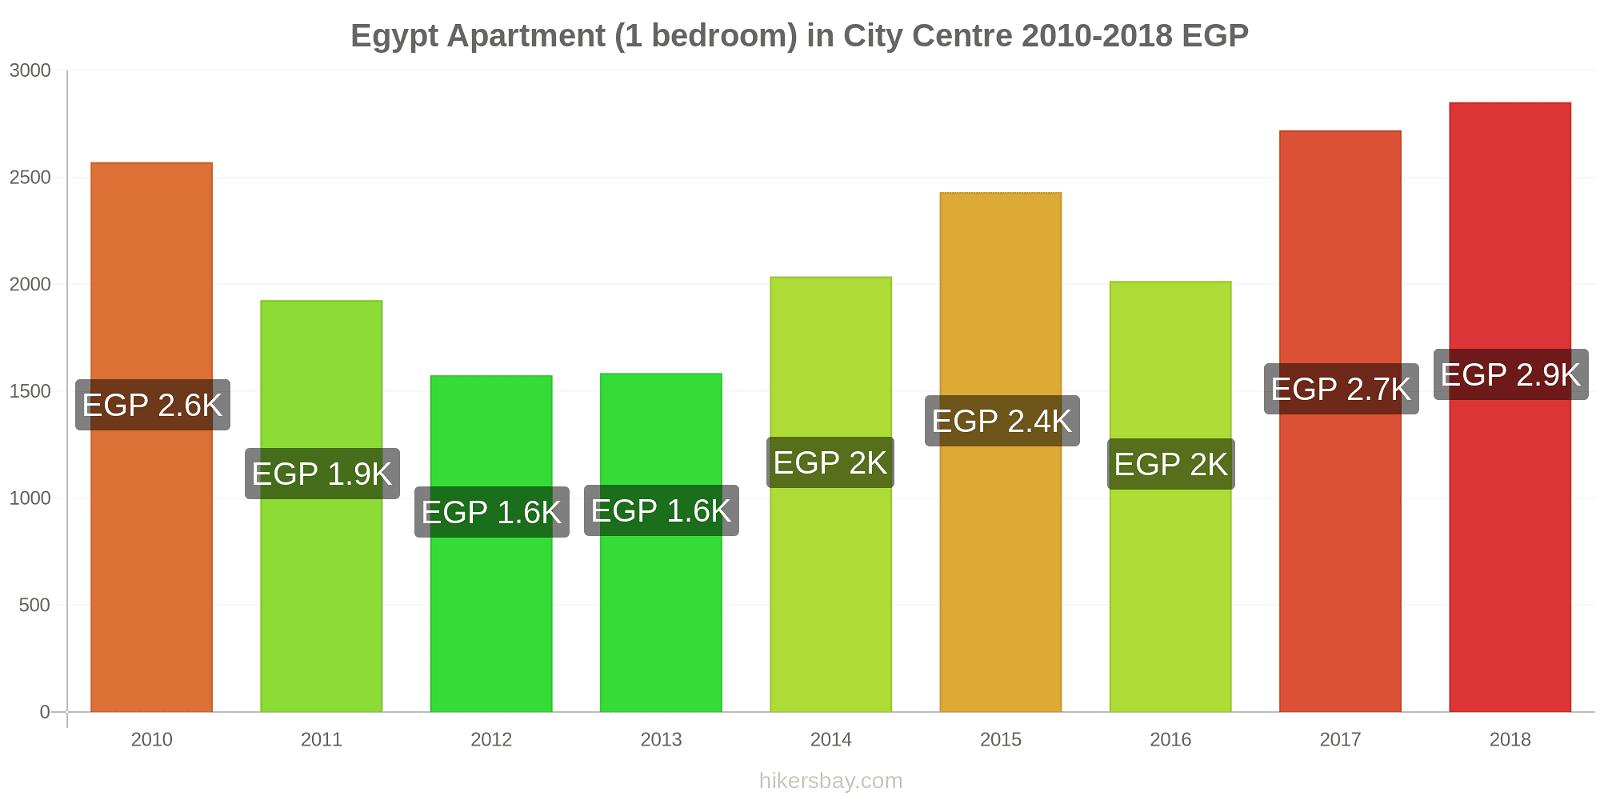 Egypt price changes Apartment (1 bedroom) in City Centre hikersbay.com